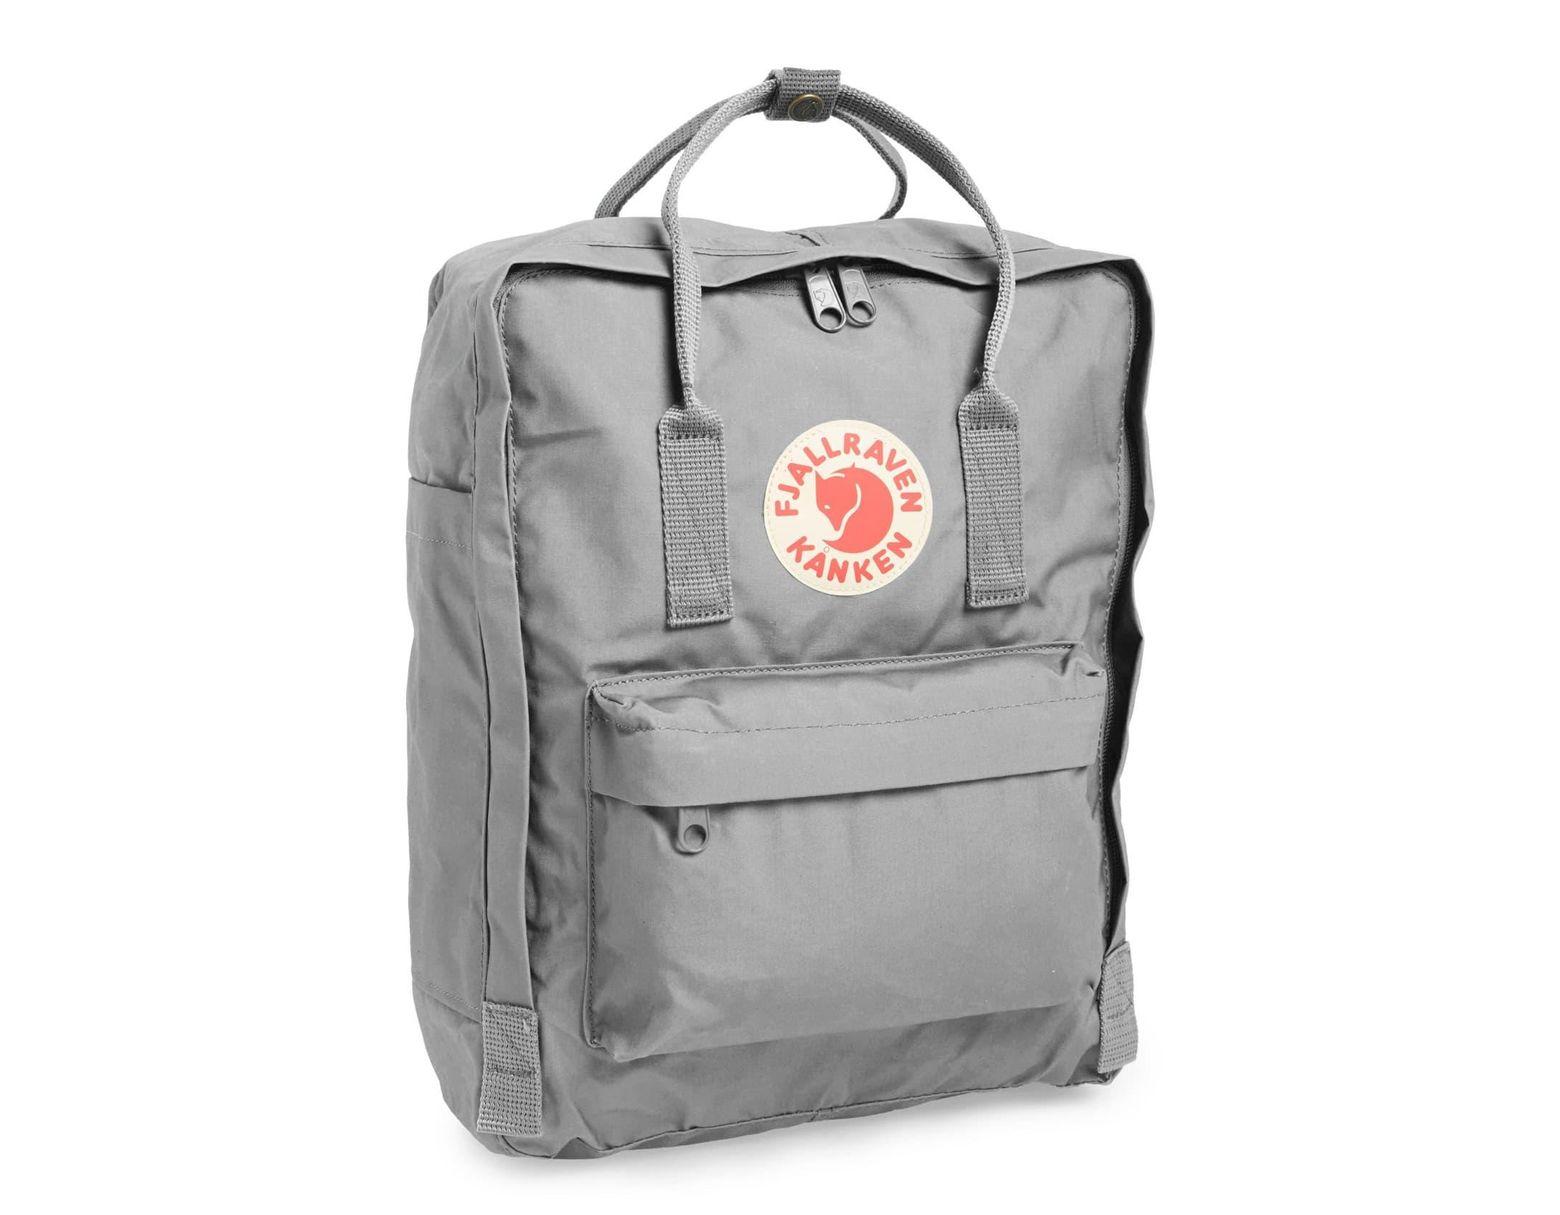 90713a3b9 Fjallraven Fjällräven Kånken Water Resistant Backpack in Gray - Save 4% -  Lyst